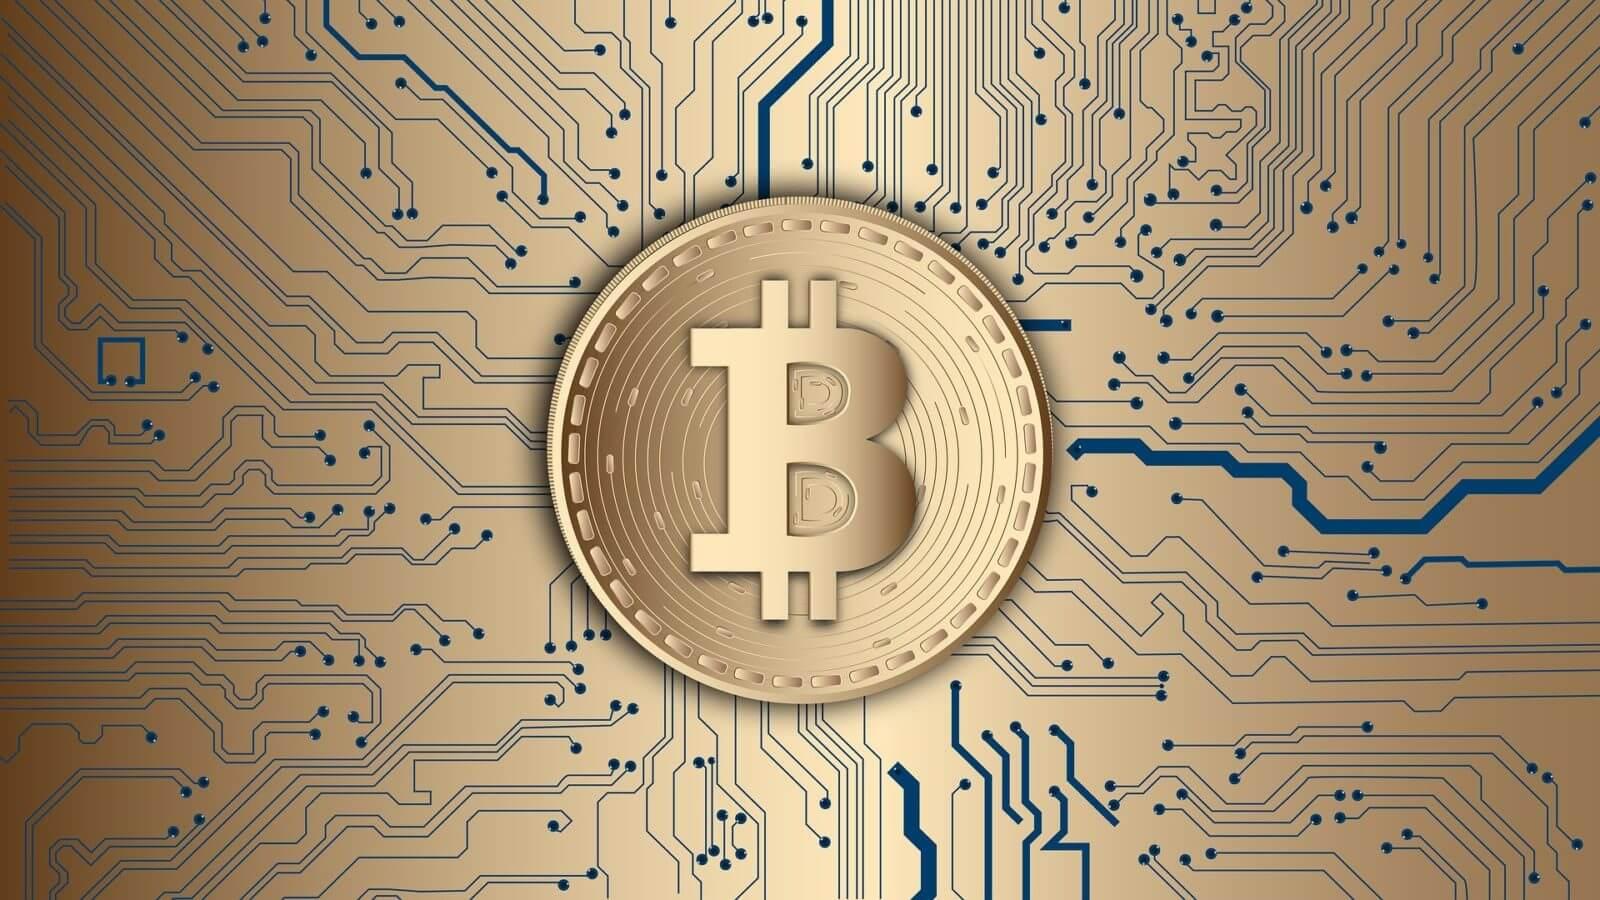 Second Round of Bitcoin DevFund Grants Announced